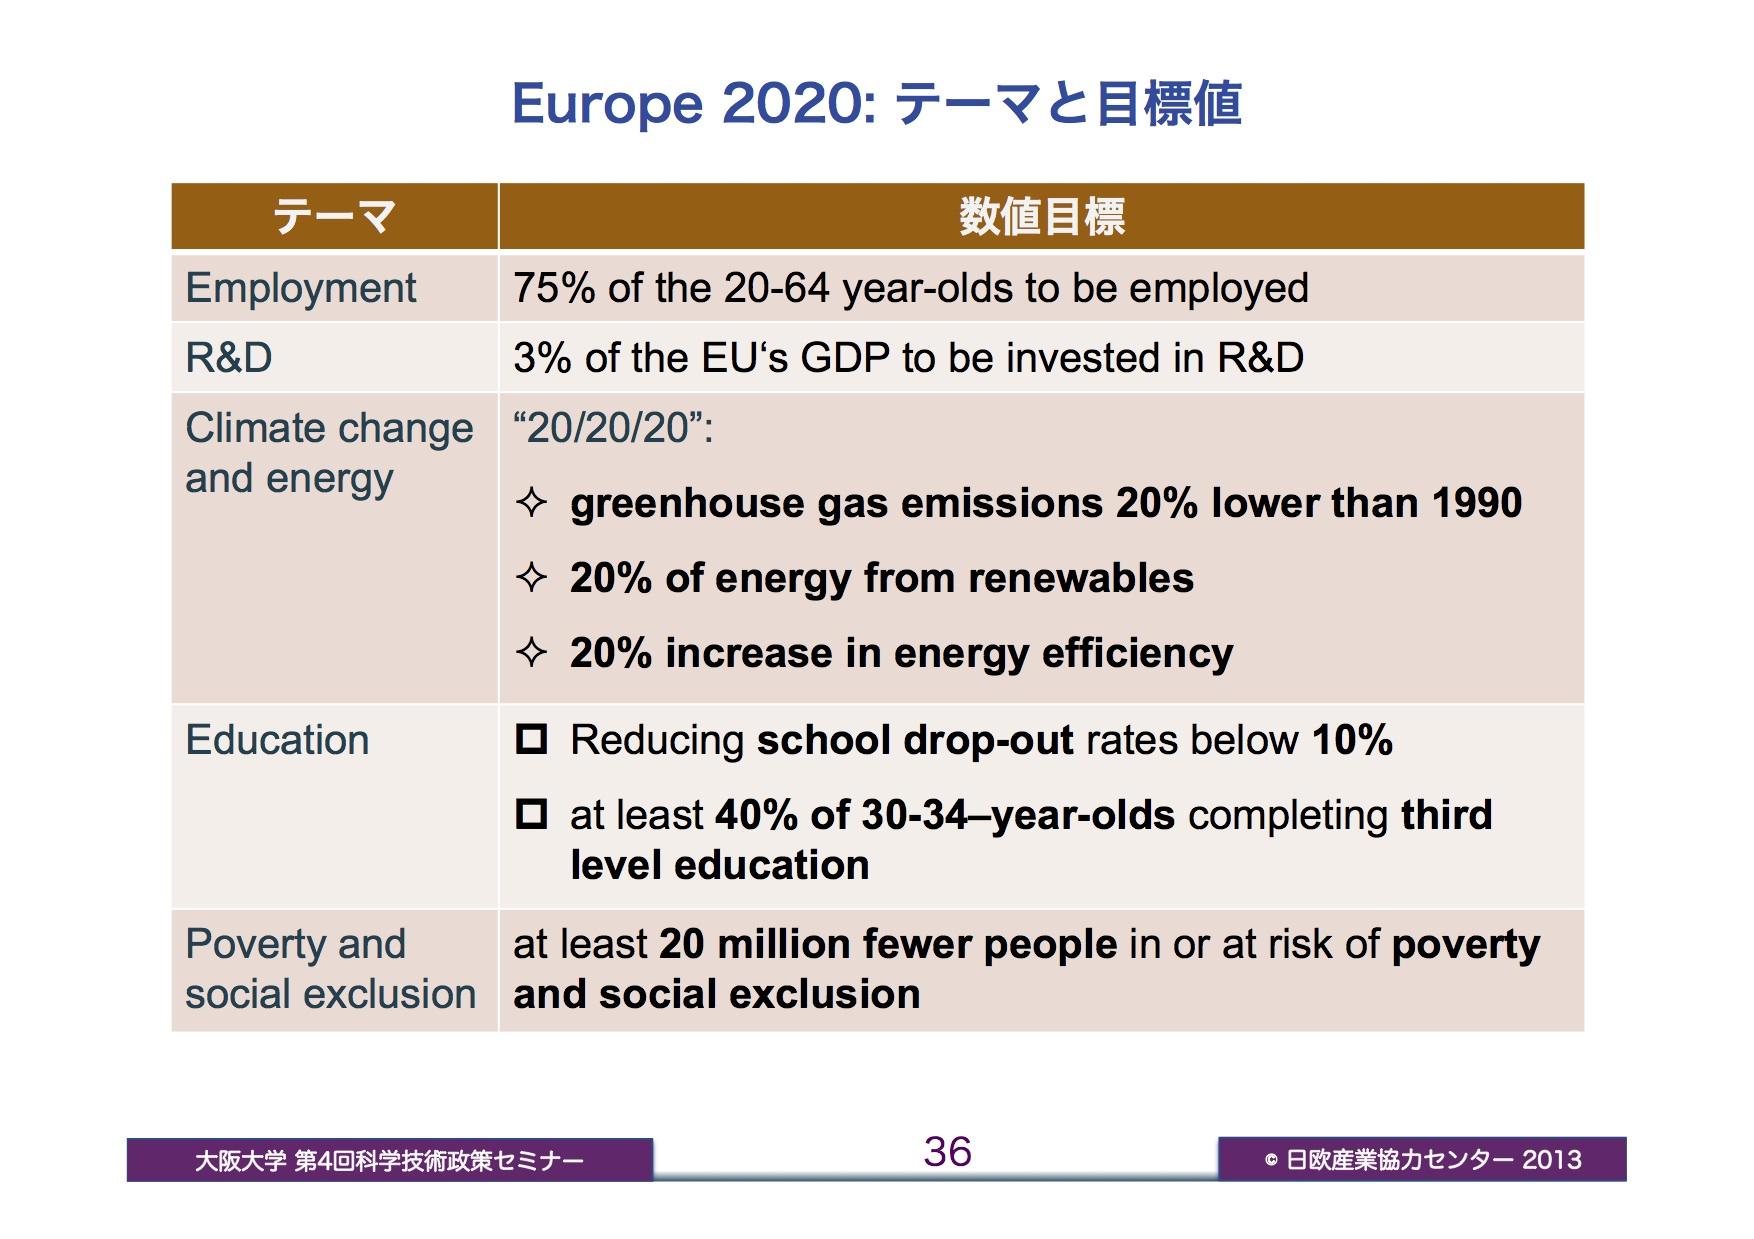 Europe 2020のテーマと目標値